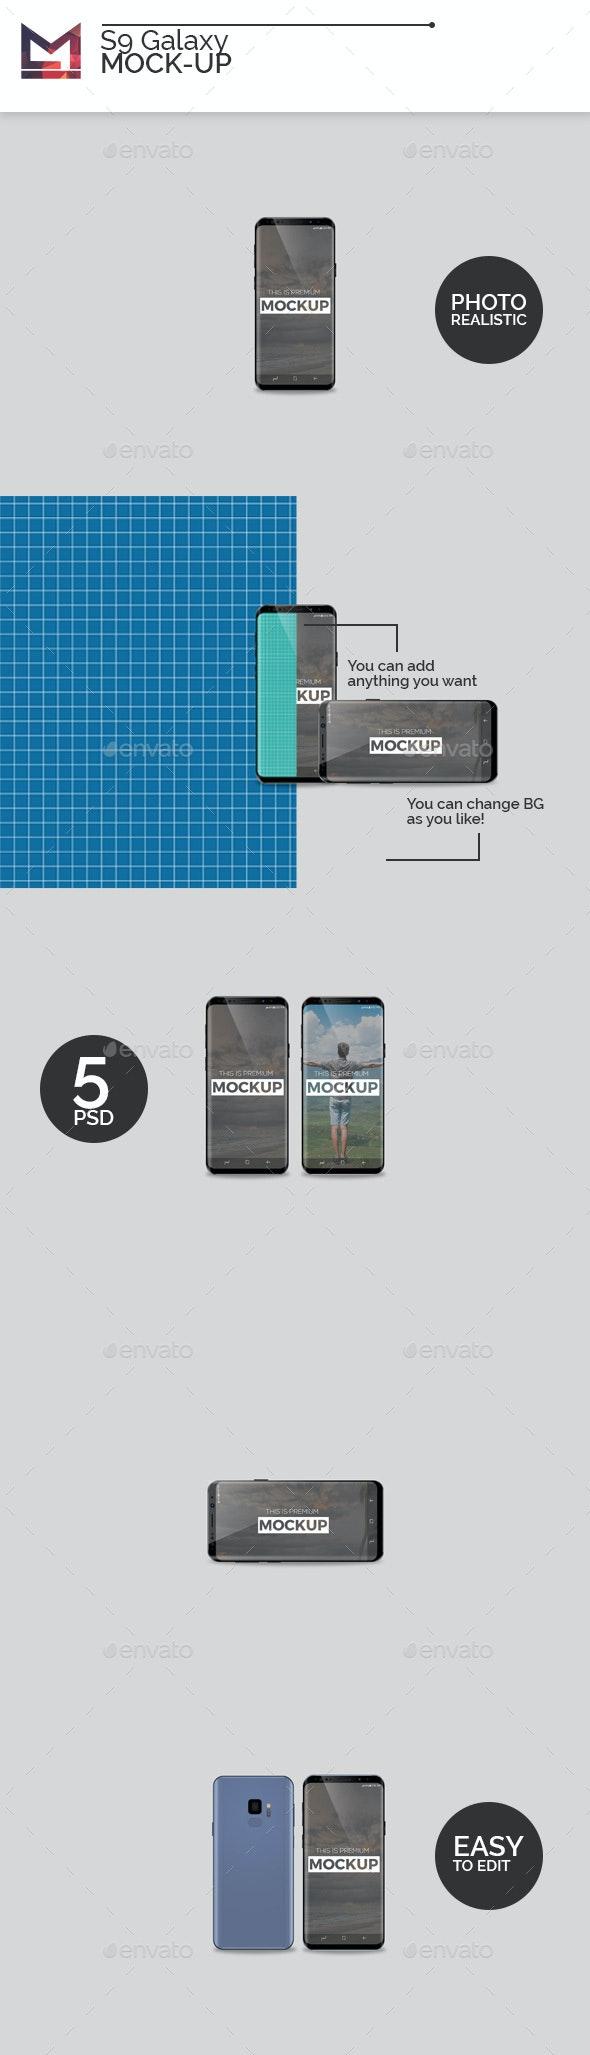 S9 Galaxy Mock-Ups - Mobile Displays